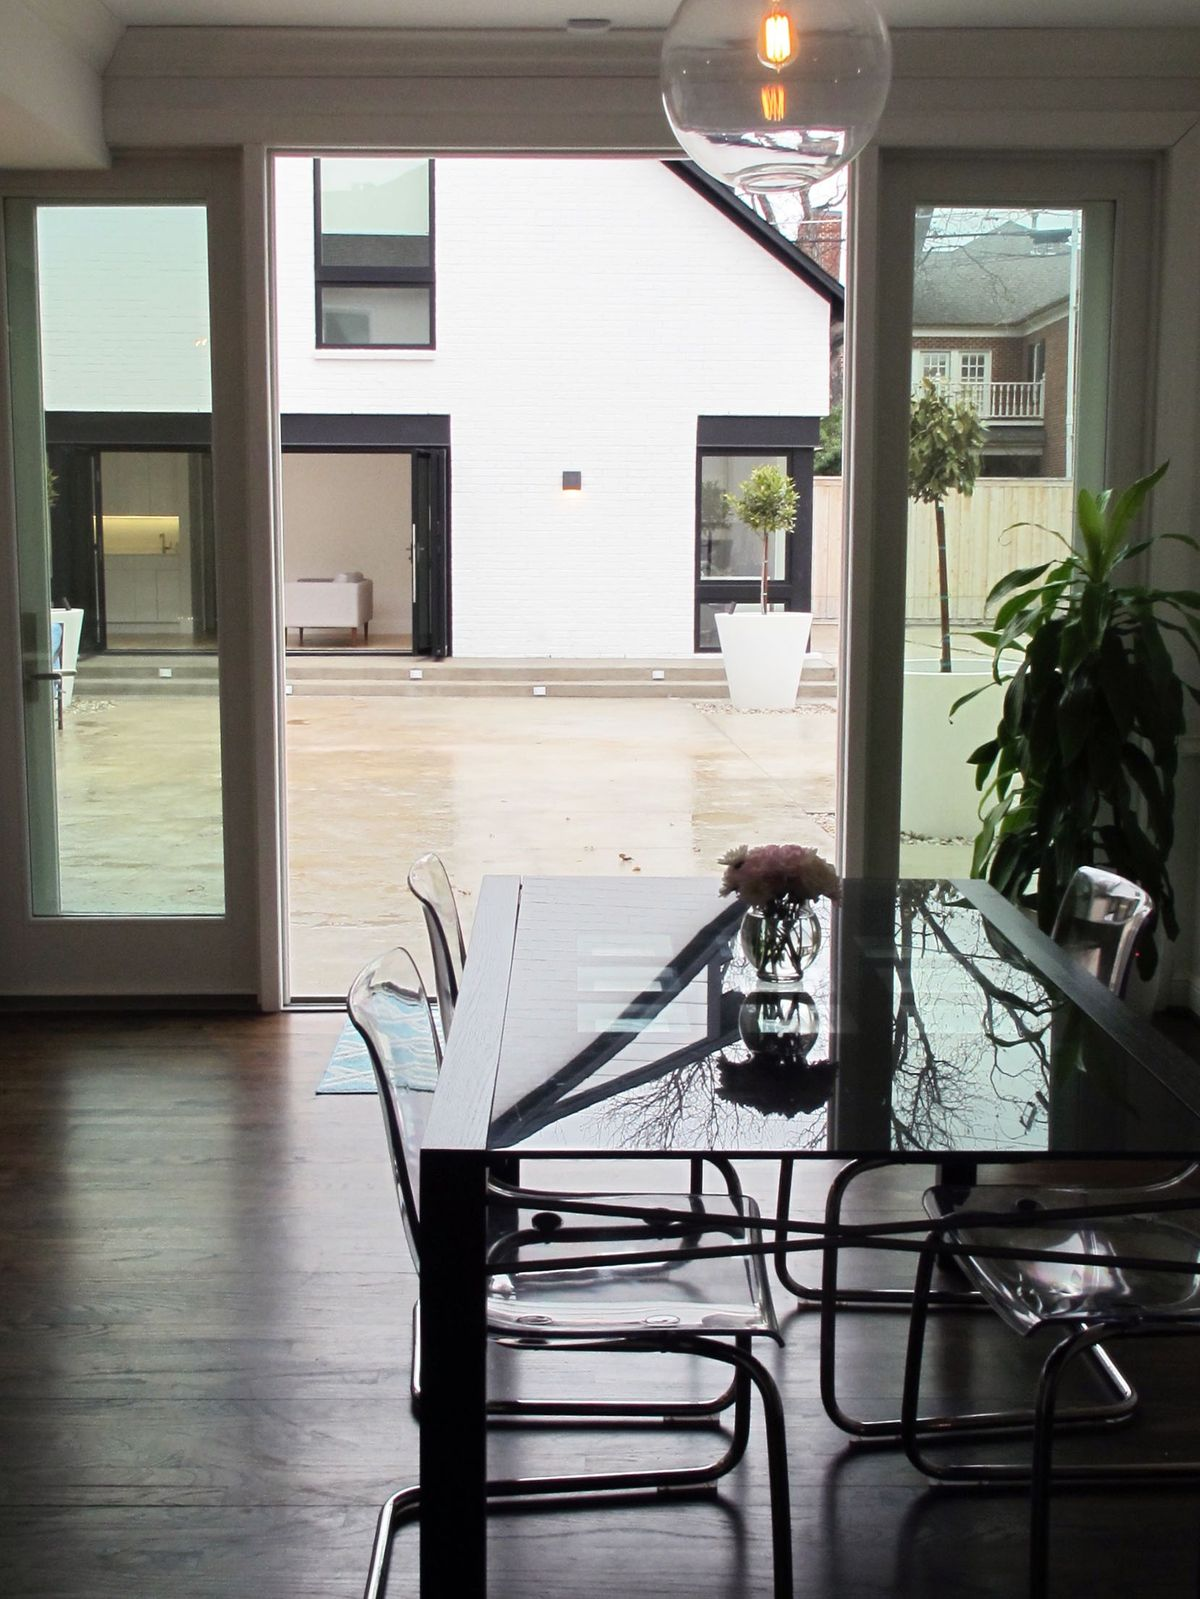 Donohoe Contemporary Modern Home Photo Video Shoot Location 10.jpg